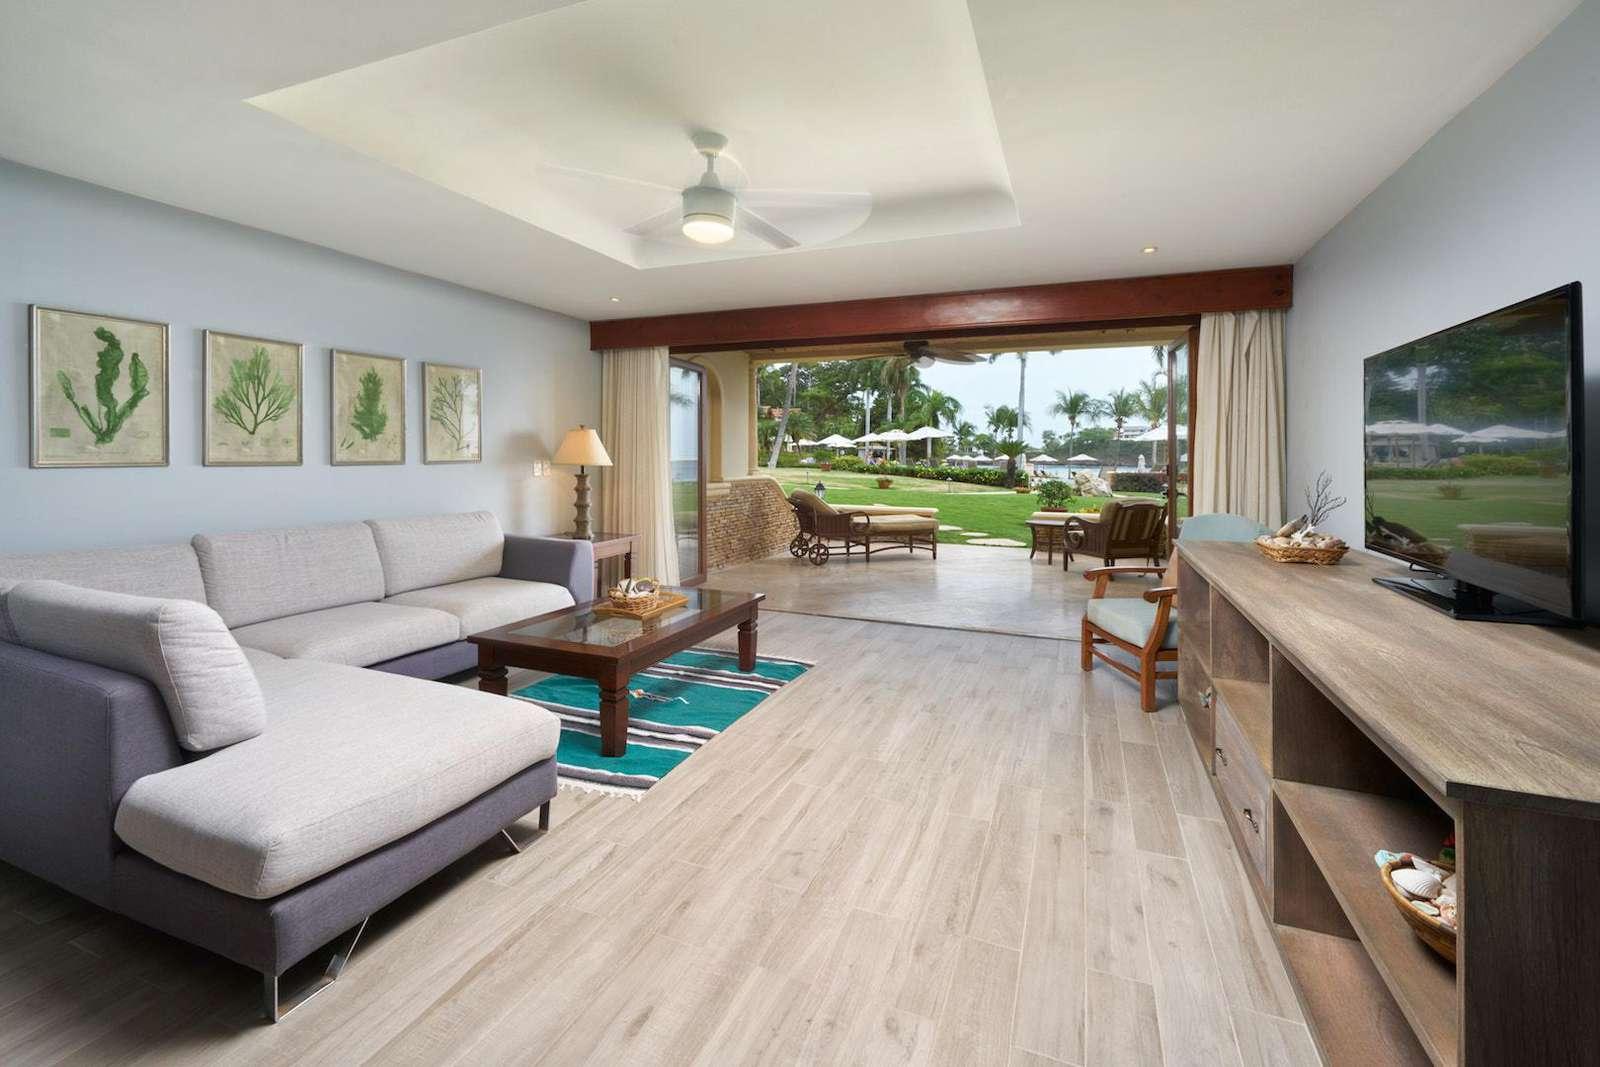 Living area looking towards ocean and pool